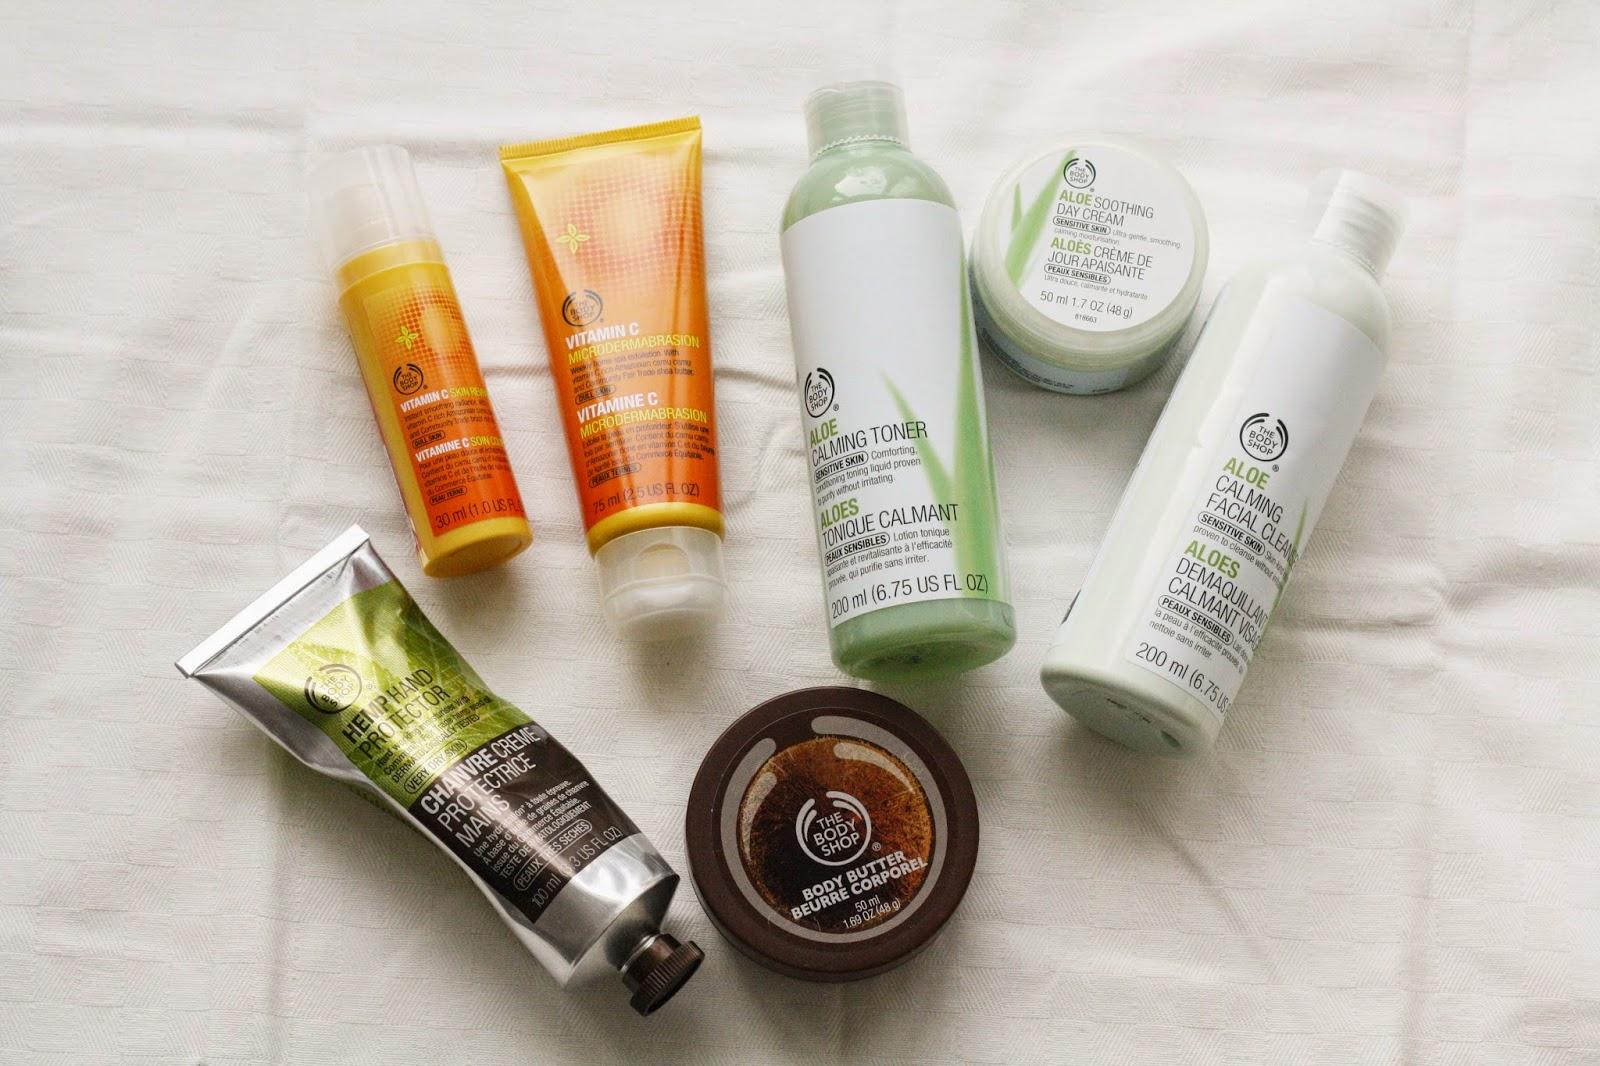 The Body Shop Vitamin C Aloe Range